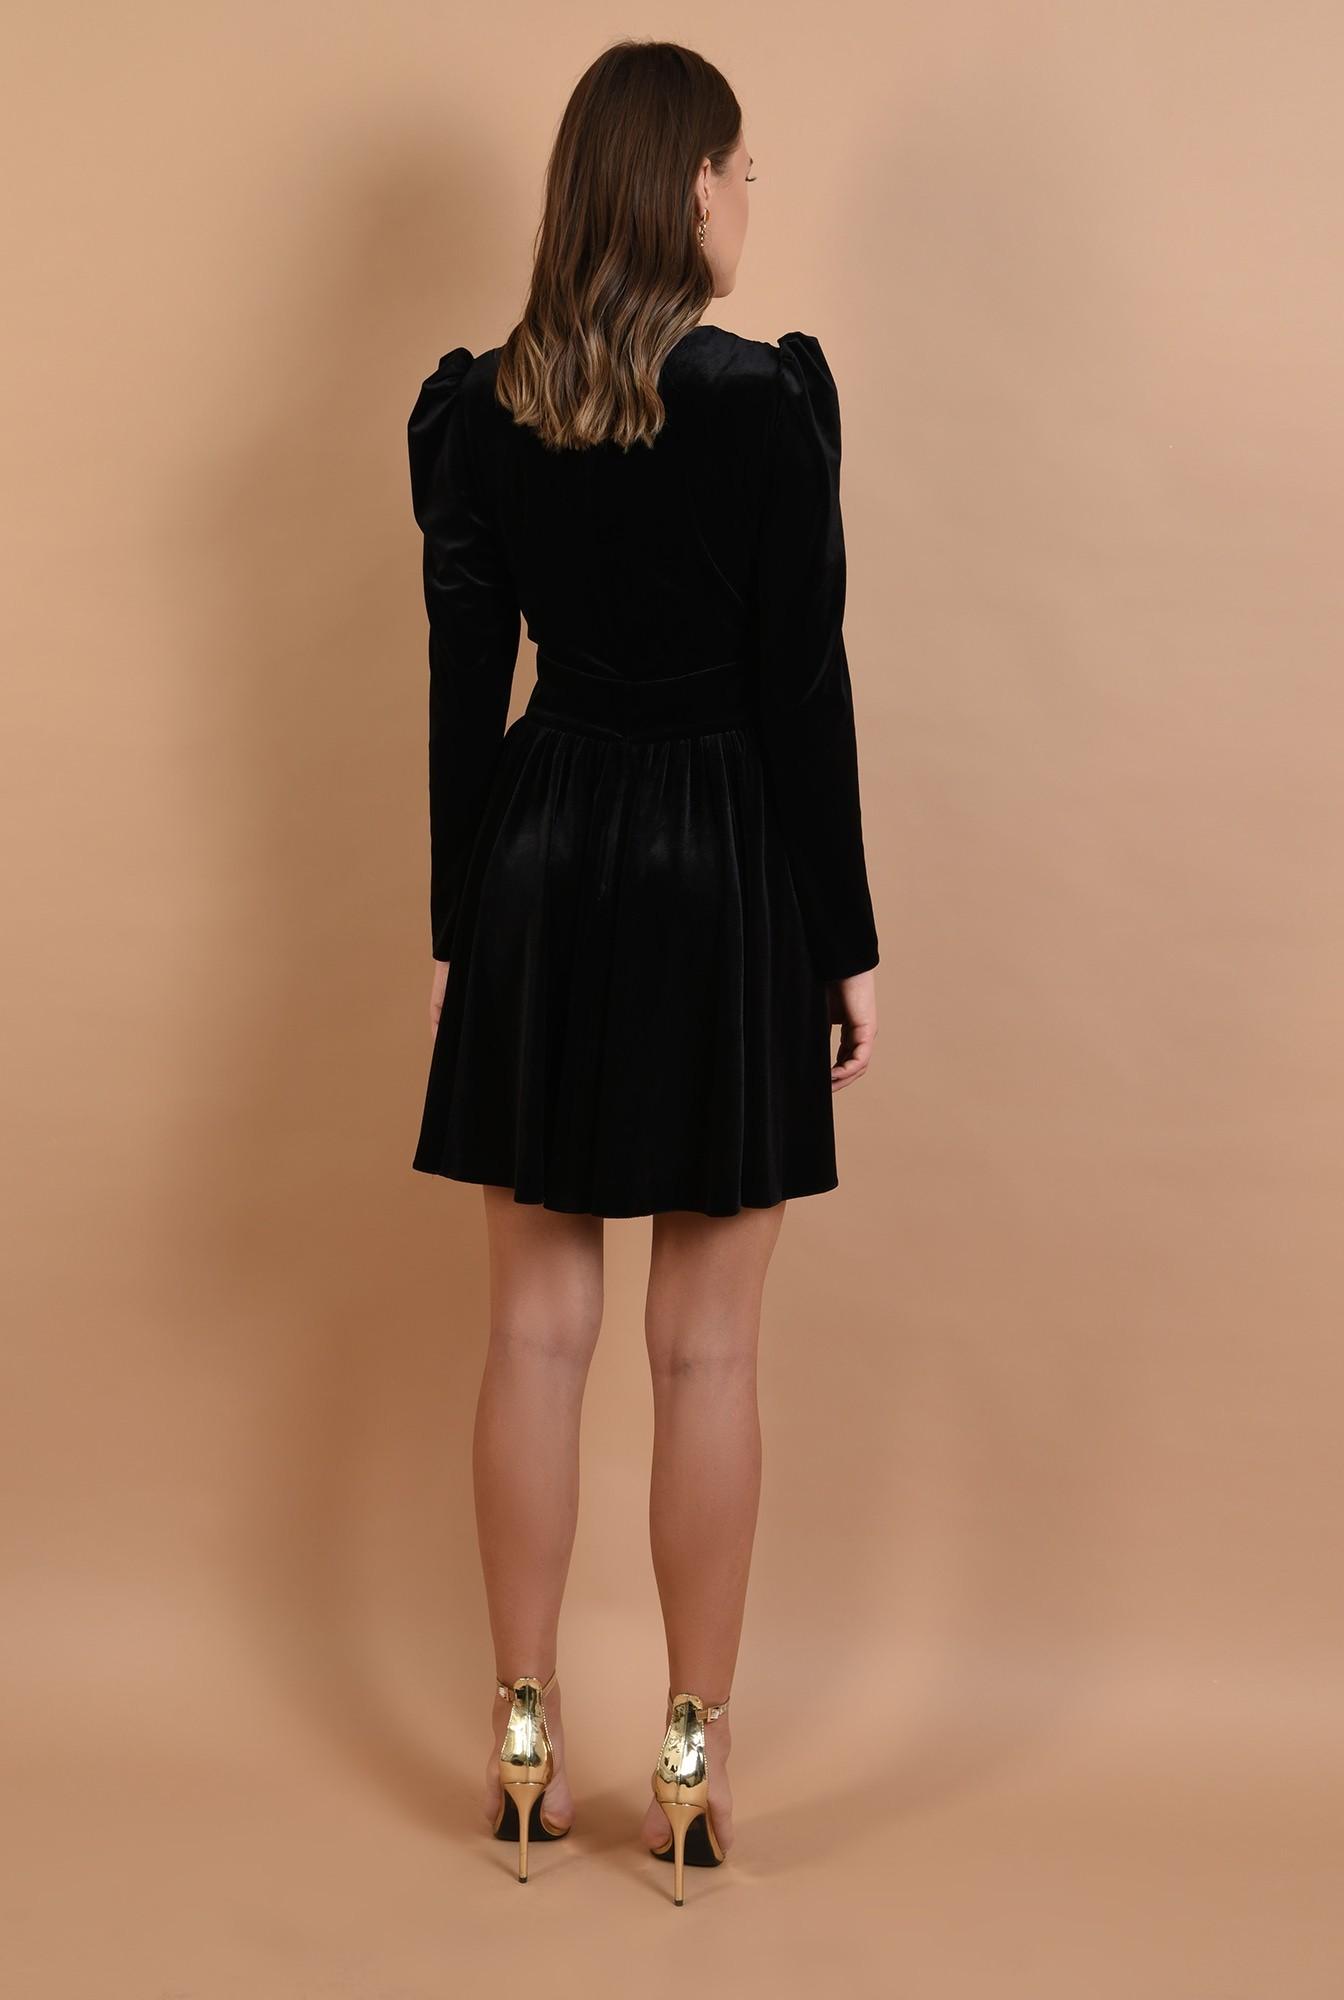 1 - rochie eleganta, din catifea, neagra, scurta